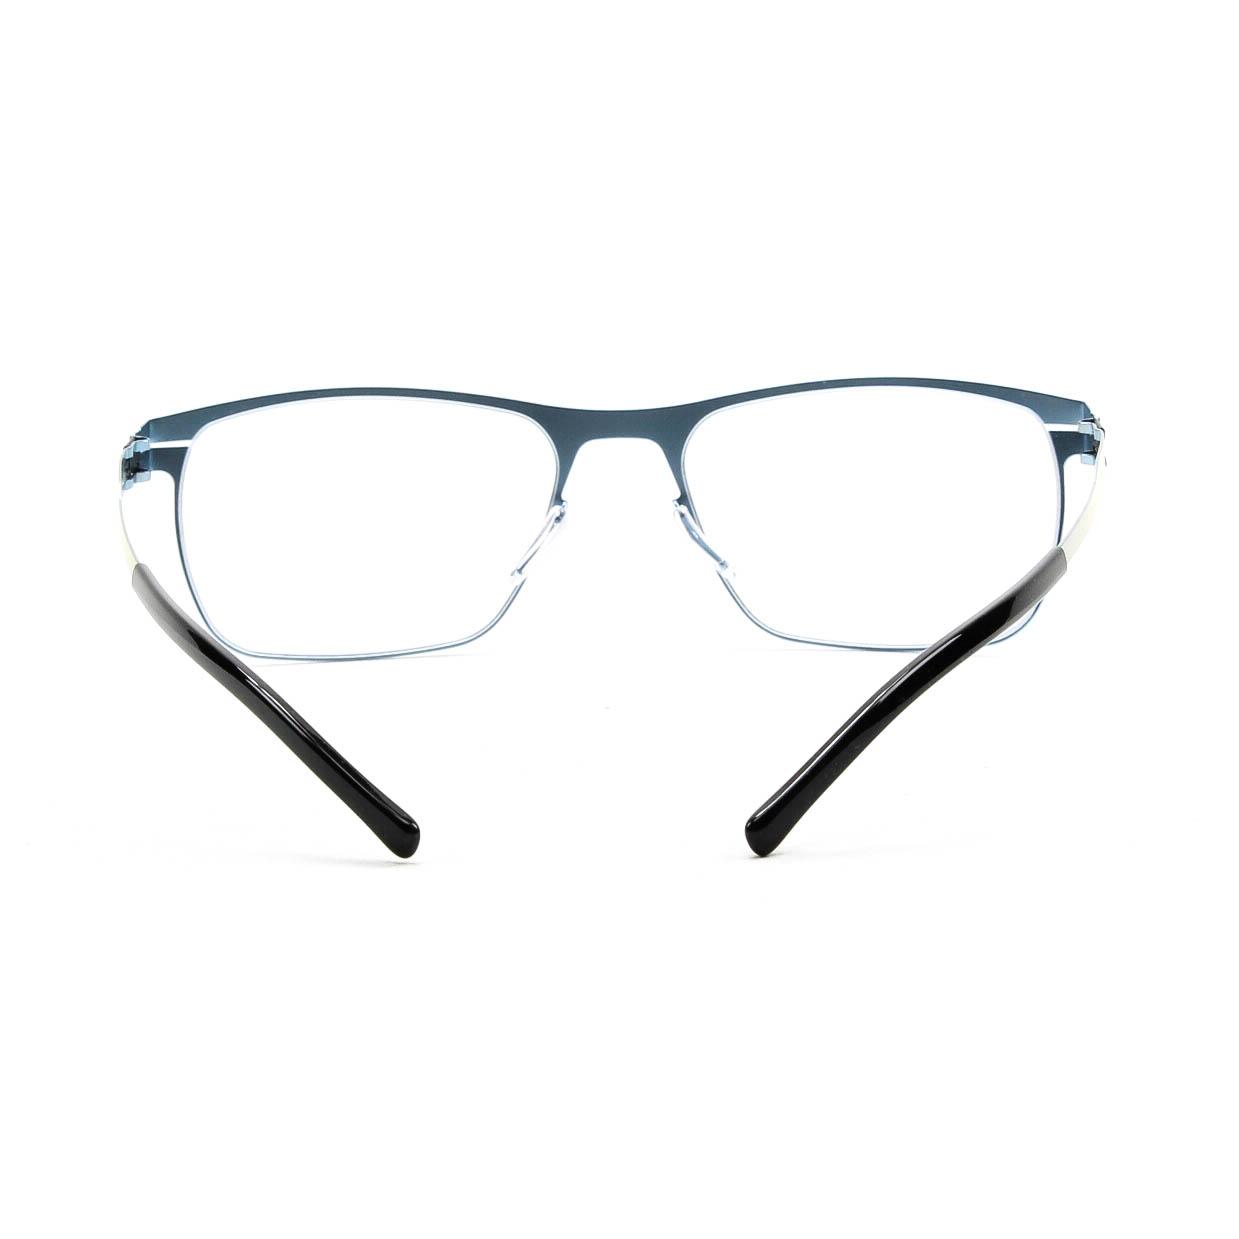 Pale Blue Glasses Frames : ic! berlin M1221 Julius Eyeglasses Electric Light Blue ...